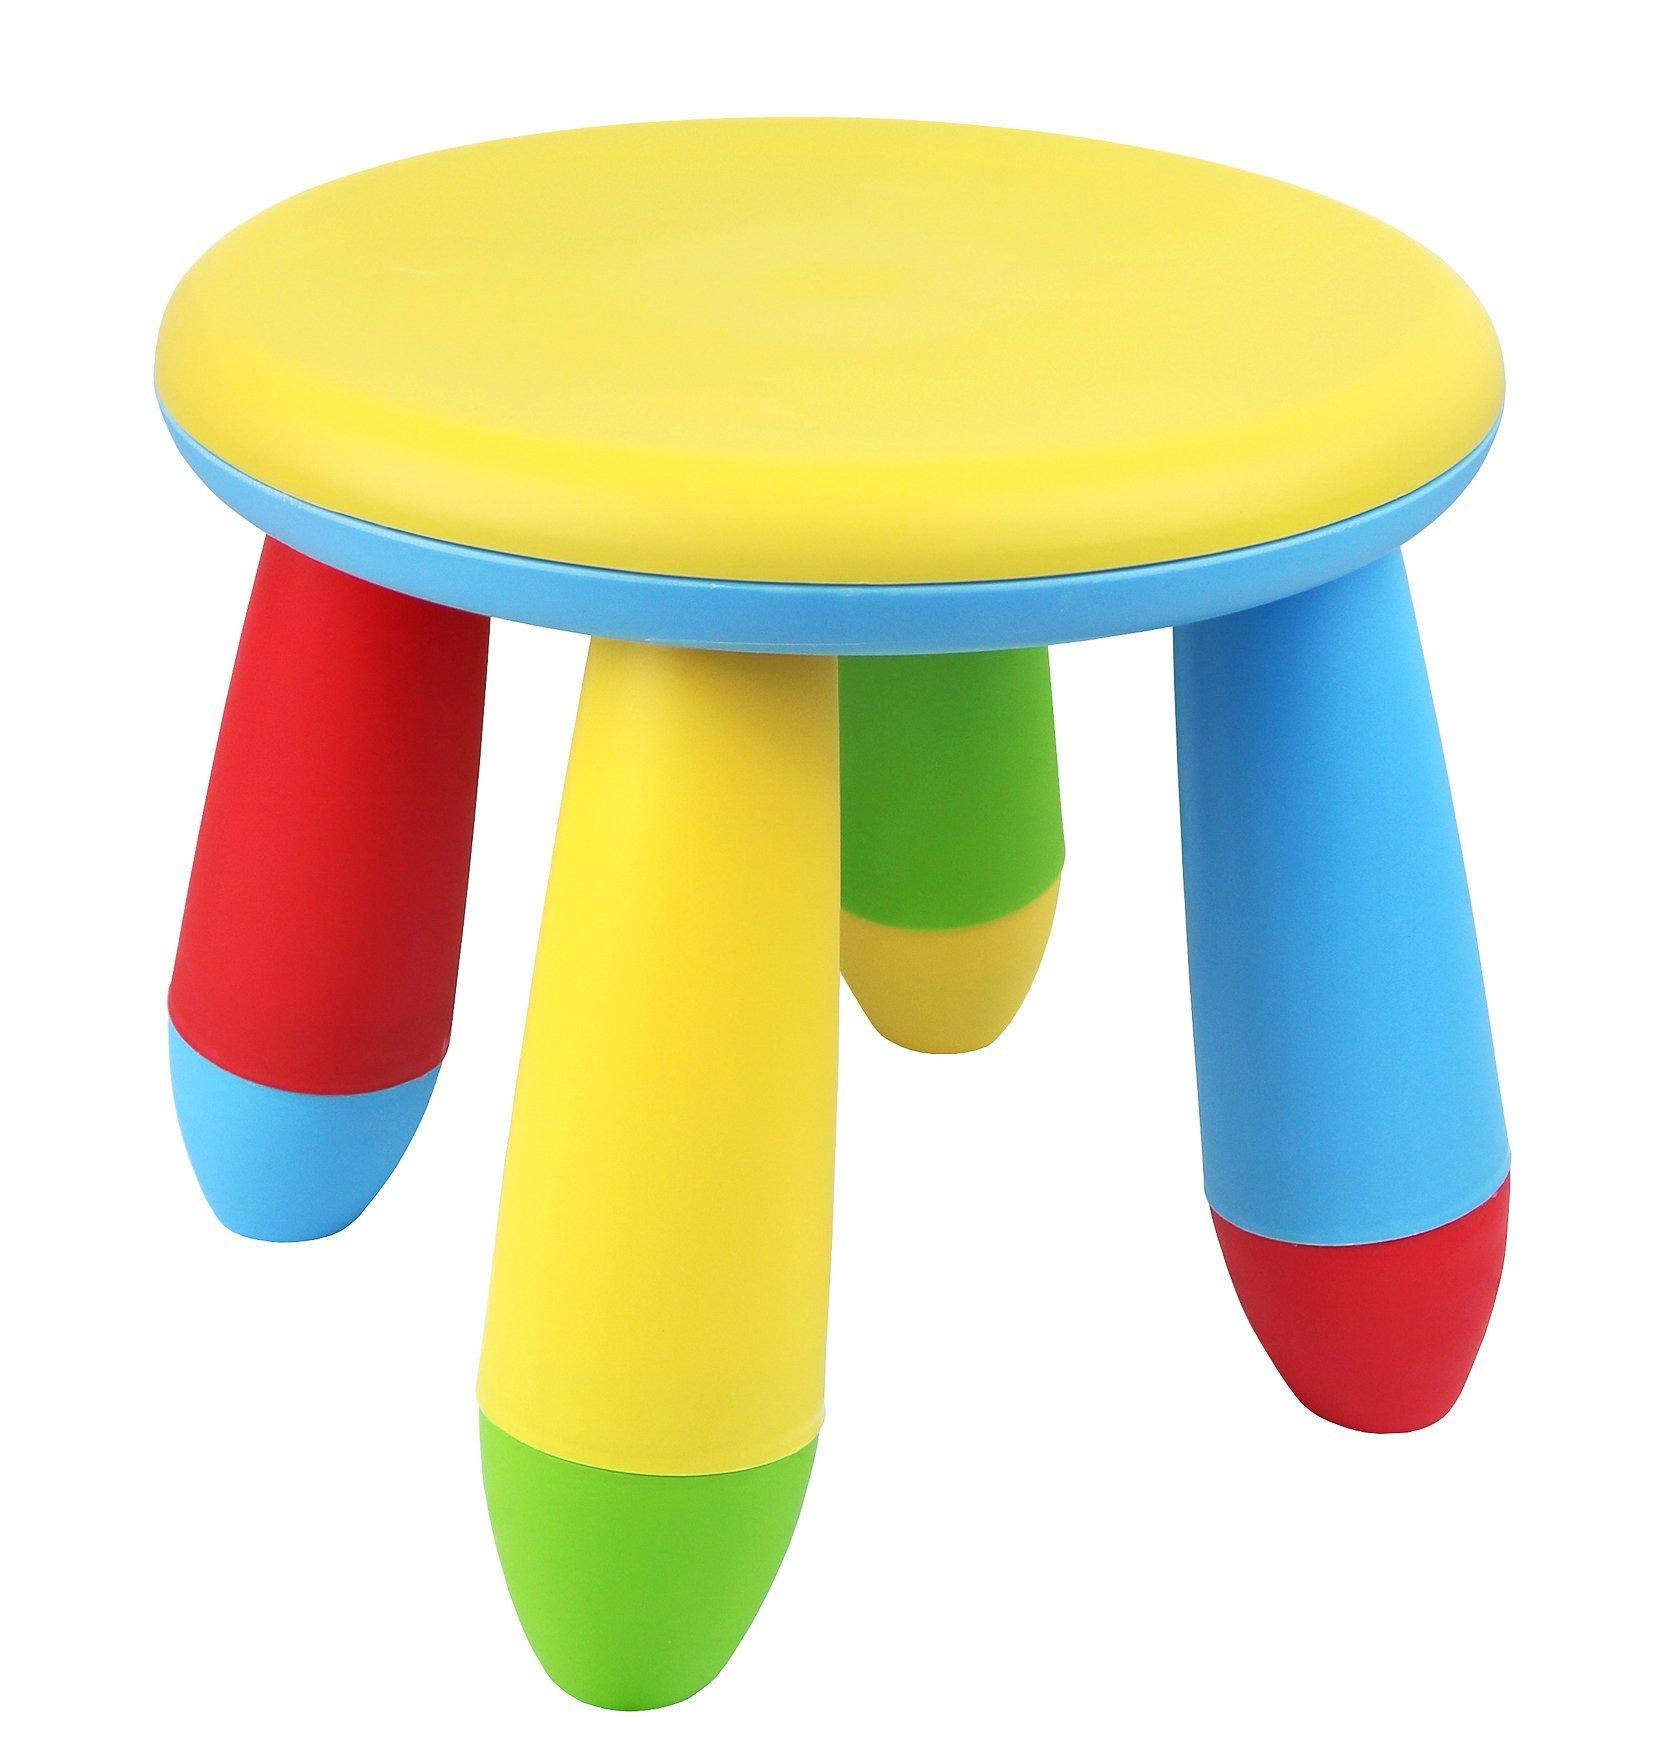 Galashield Plastic Kids Chair Stool 10'' (Yellow, 2 Pack)